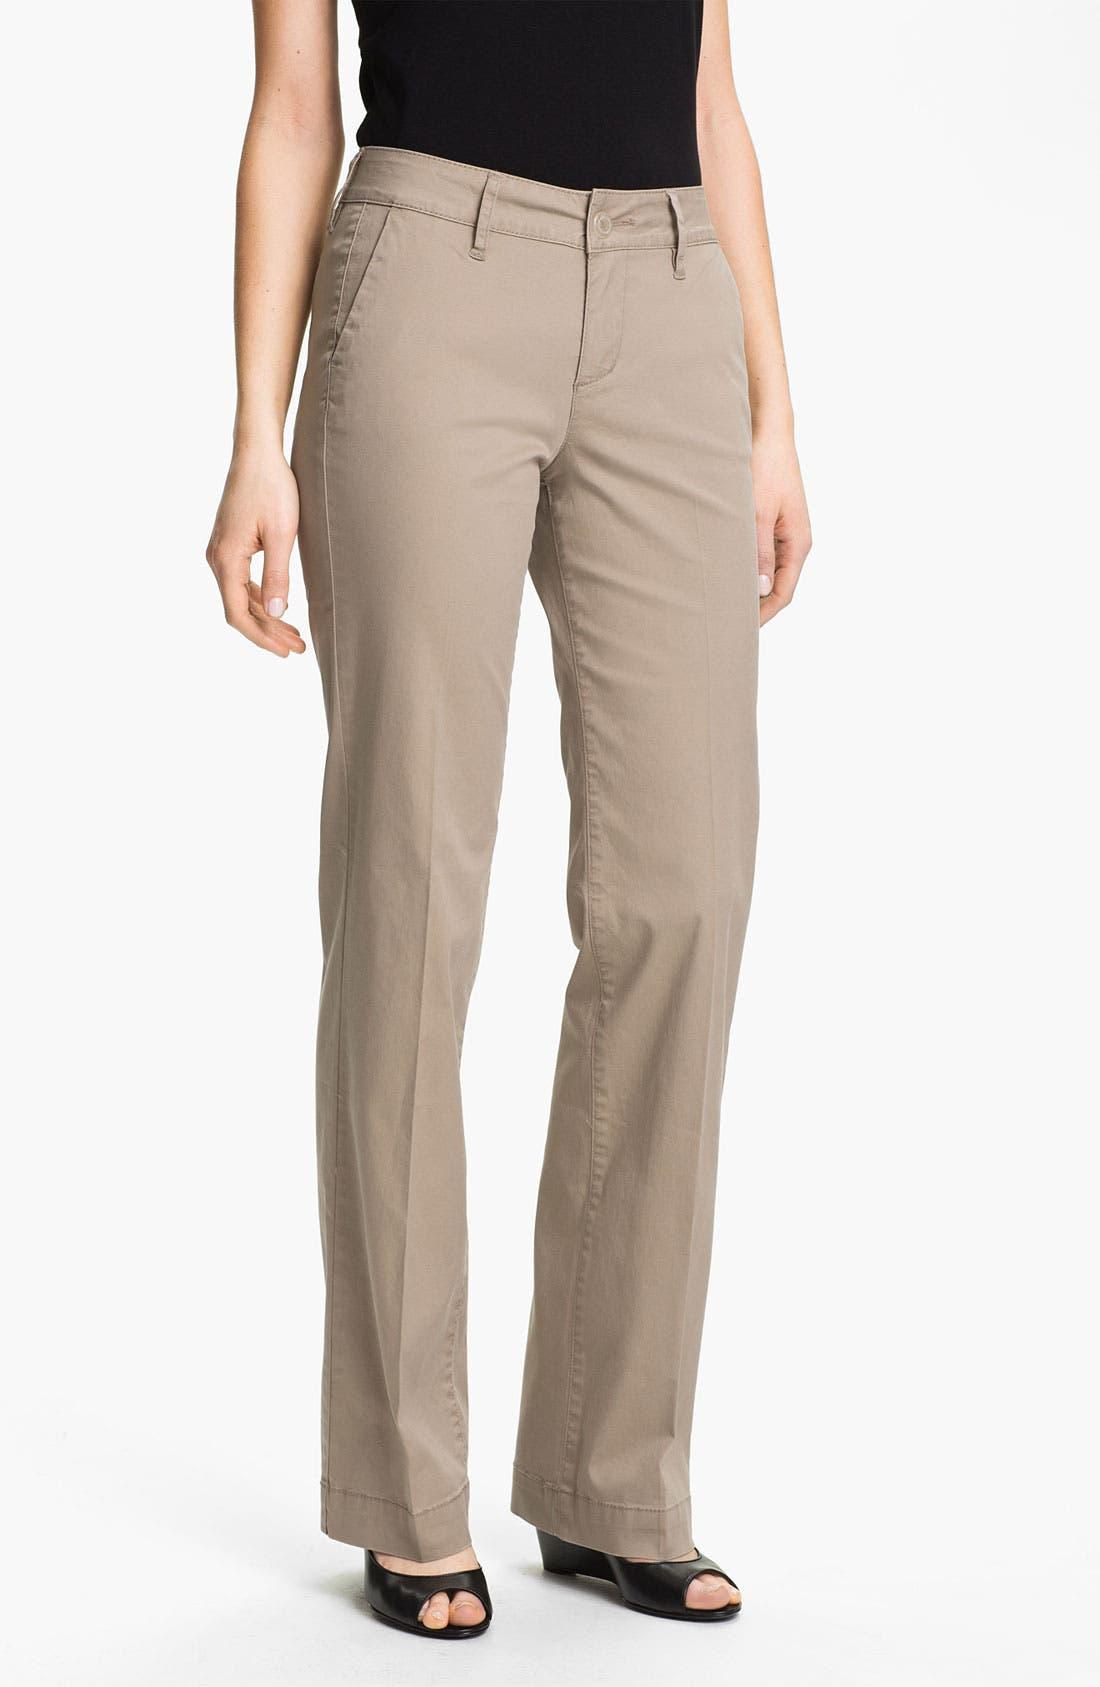 Main Image - Jag Jeans 'Maitland' Trousers (Petite)